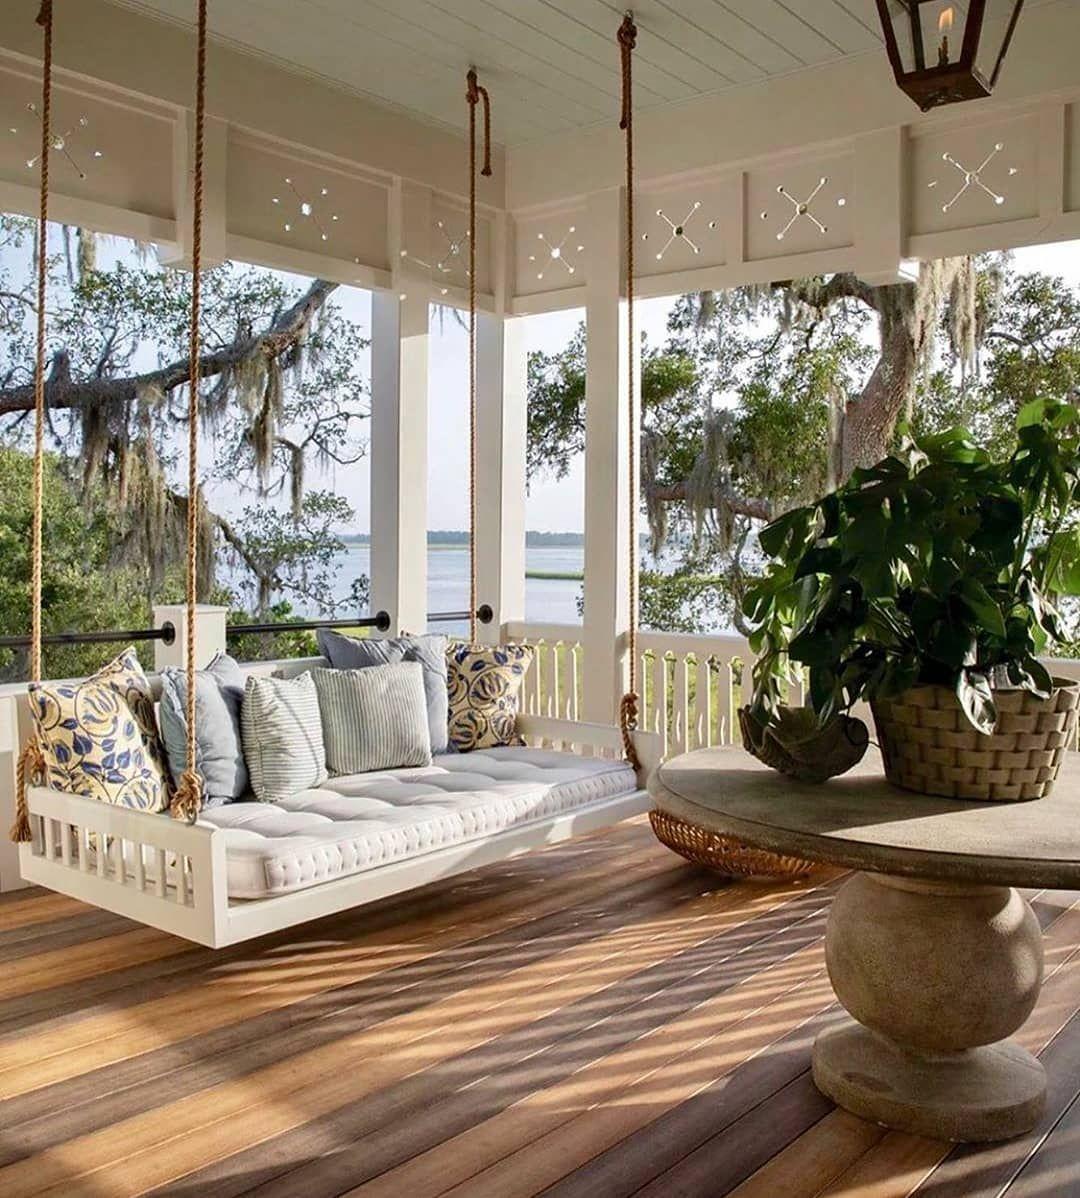 "Home Decor/Interior Design on Instagram: ""Good evening I hope everyone enjoyed the weekend... . Via @therealmlandreth59 by @berlumdev…"""